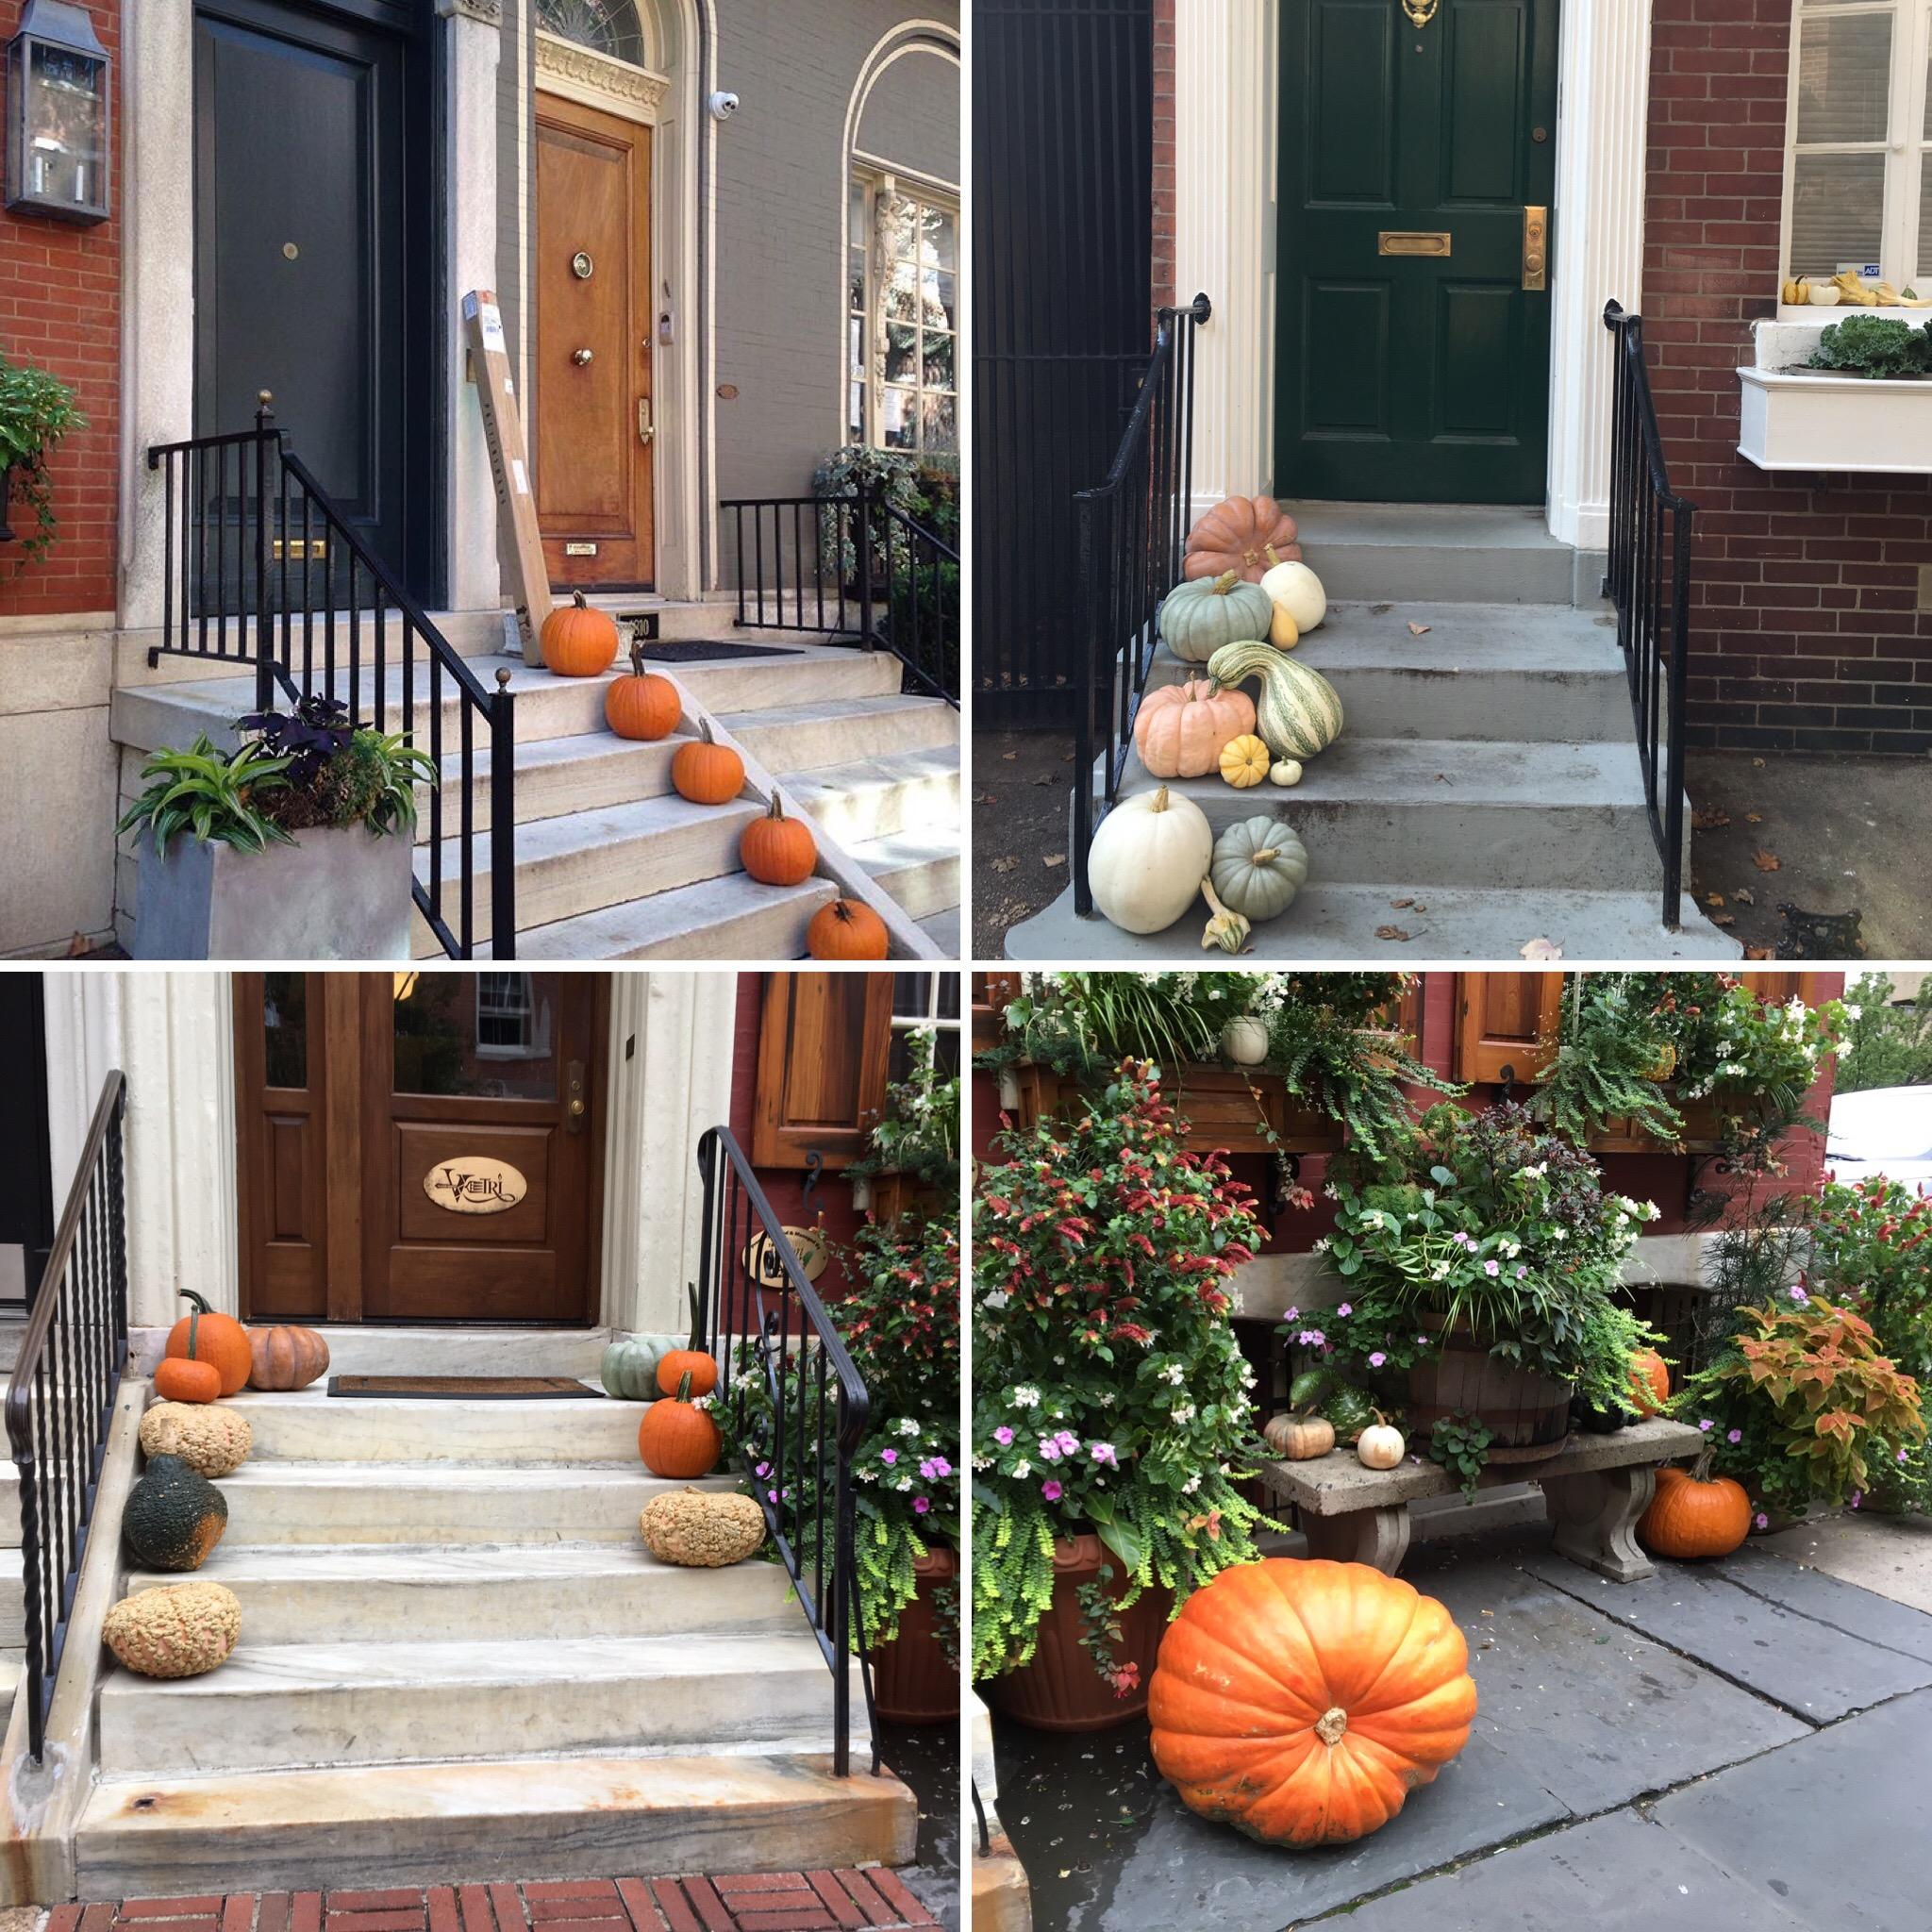 Pumpkins abound about town